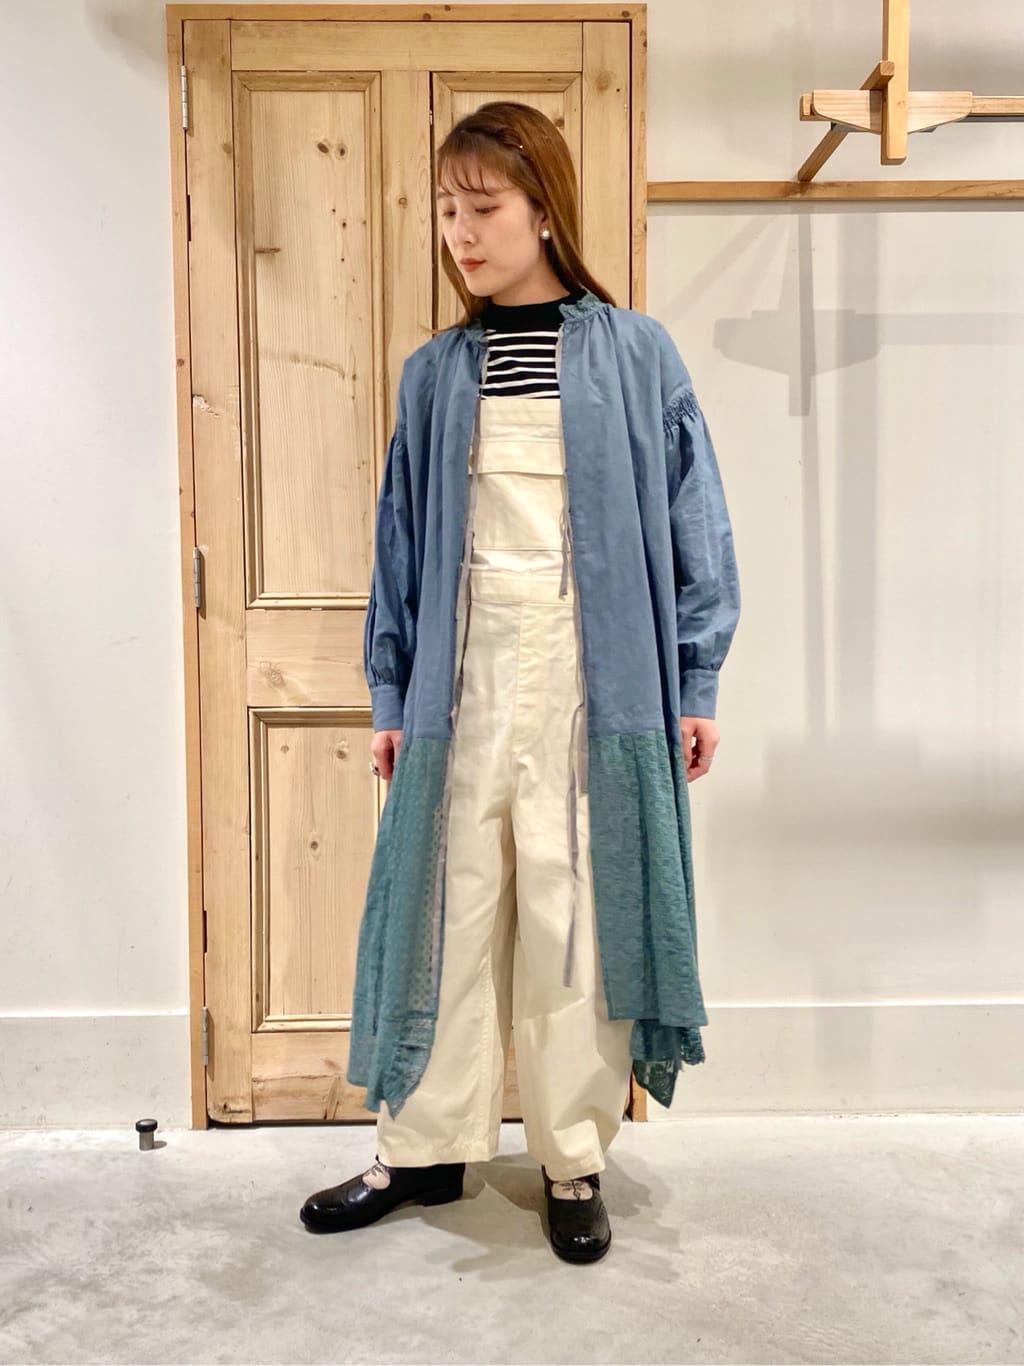 Malle chambre de charme 調布パルコ 身長:160cm 2021.09.02